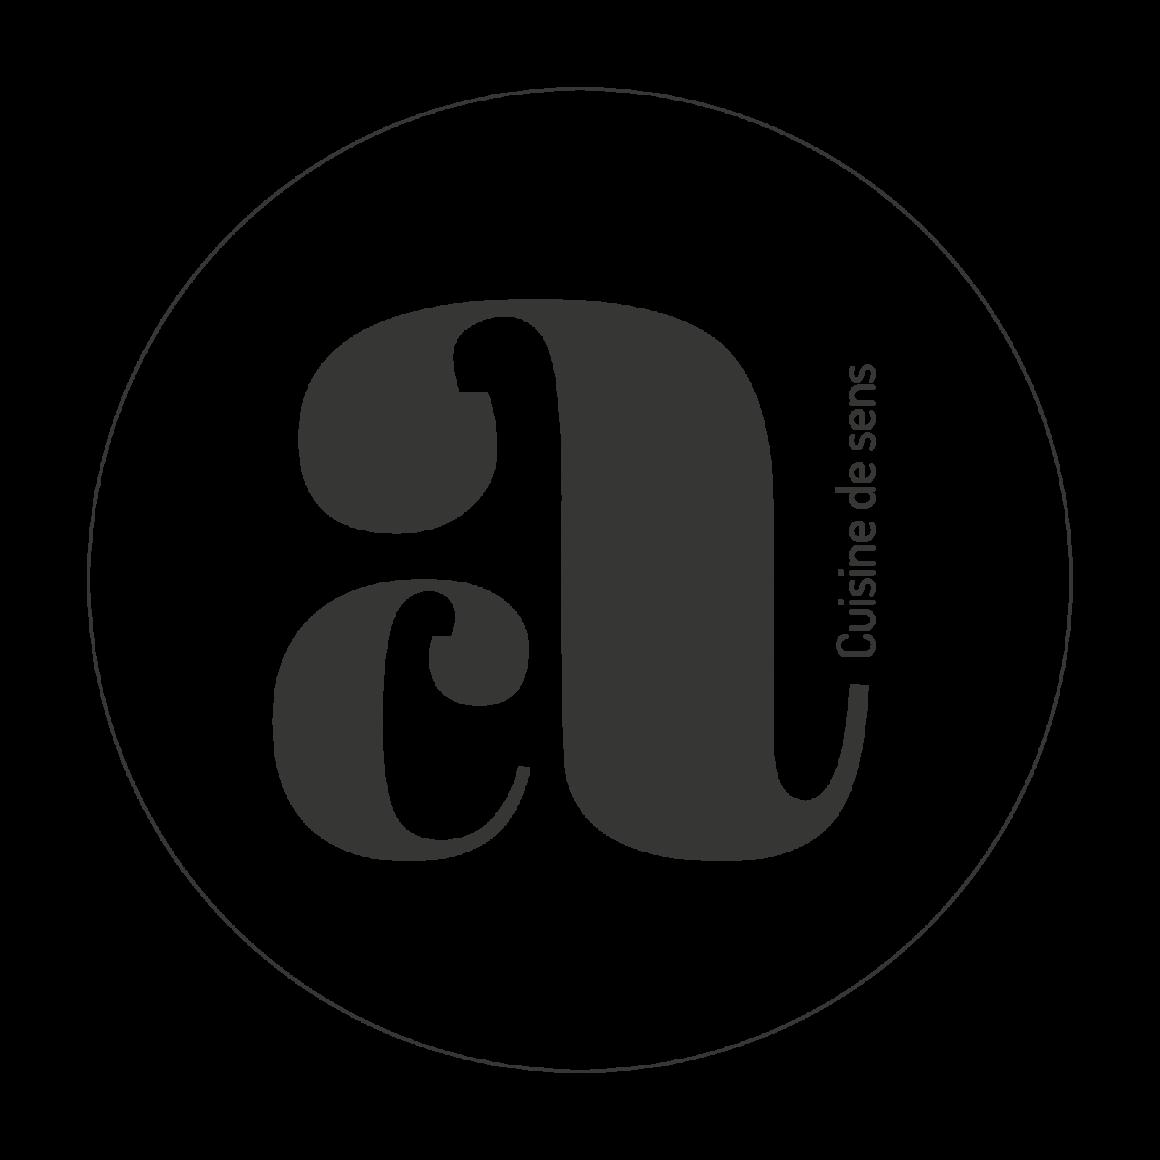 logo gris rond plein 1160x1160 Restaurant A Contre Sens